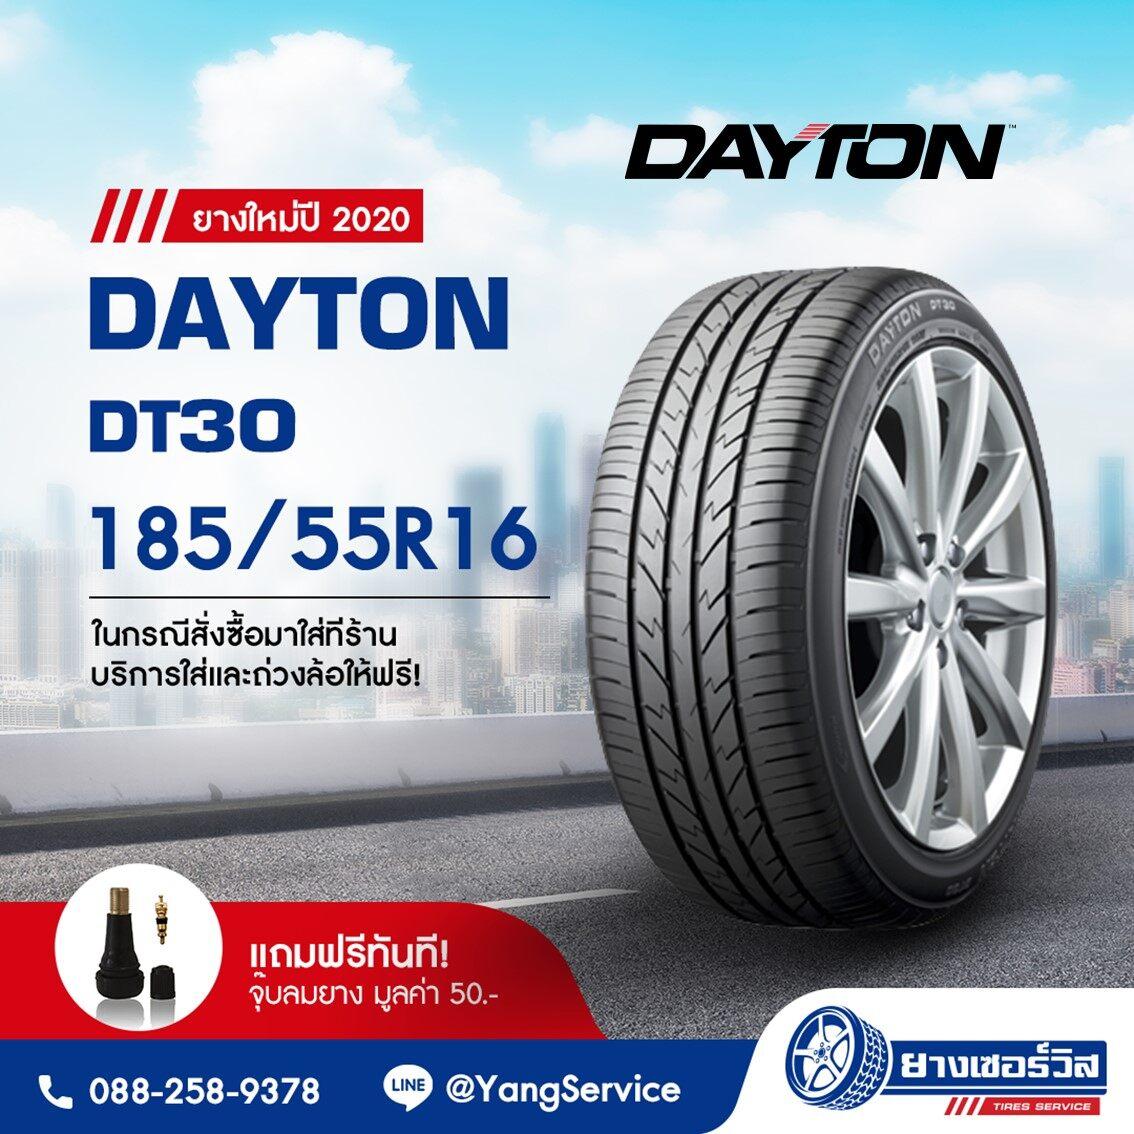 185/55r16 Dayton Dt30 (เดย์ตั้น ดีที 30) ยางใหม่ปี2020 รับประกันคุณภาพ มาตรฐานส่งตรงถึงบ้านคุณ.